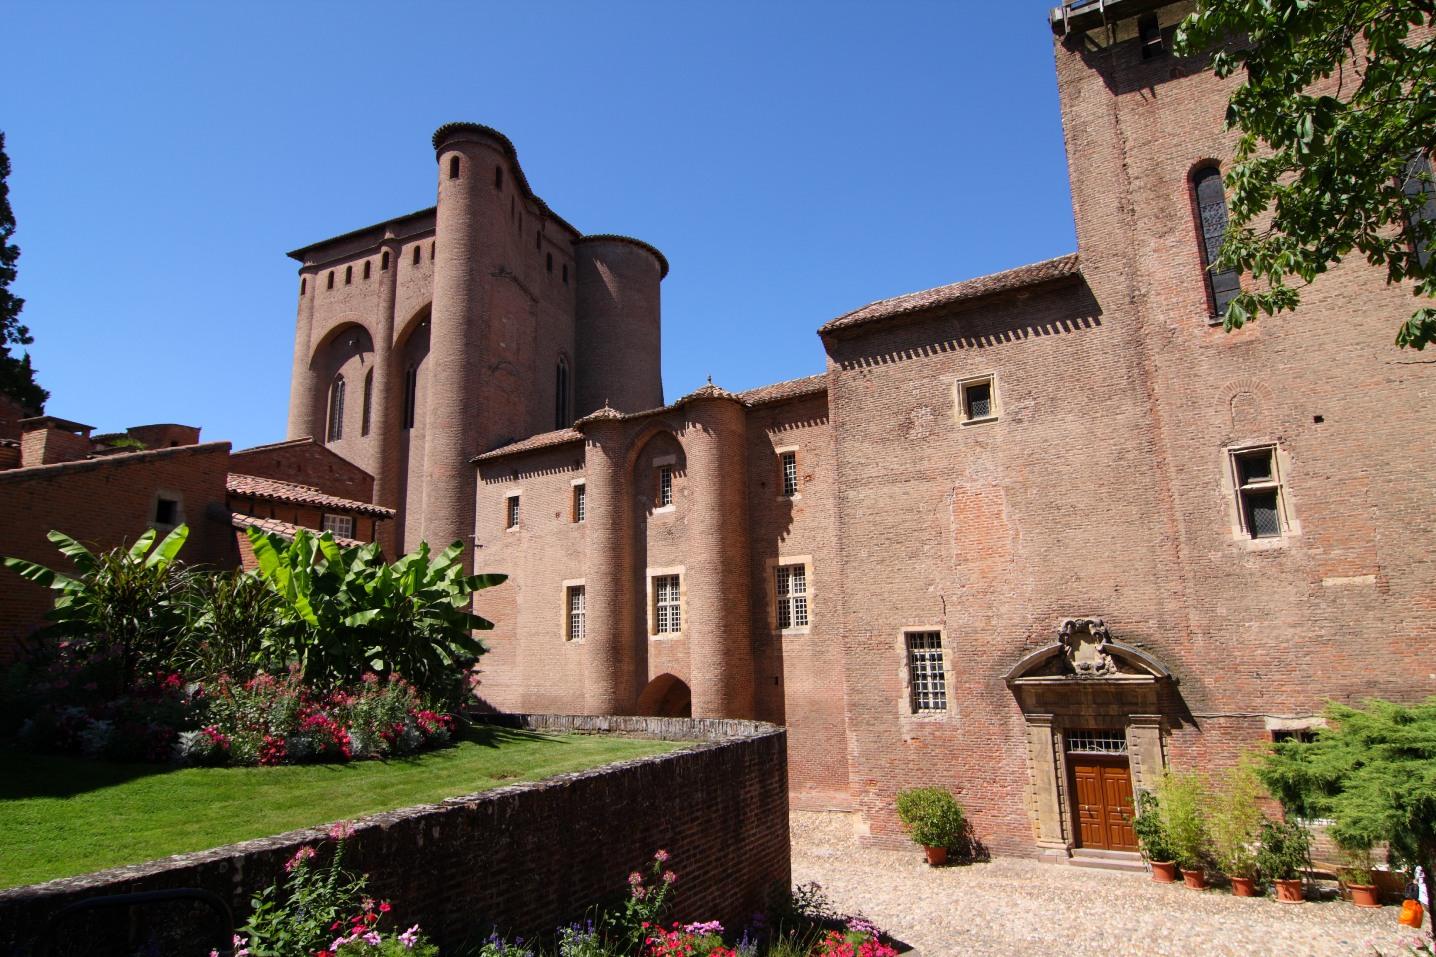 1486-musee-toulouse-lautrec-albi-occitanie.jpg